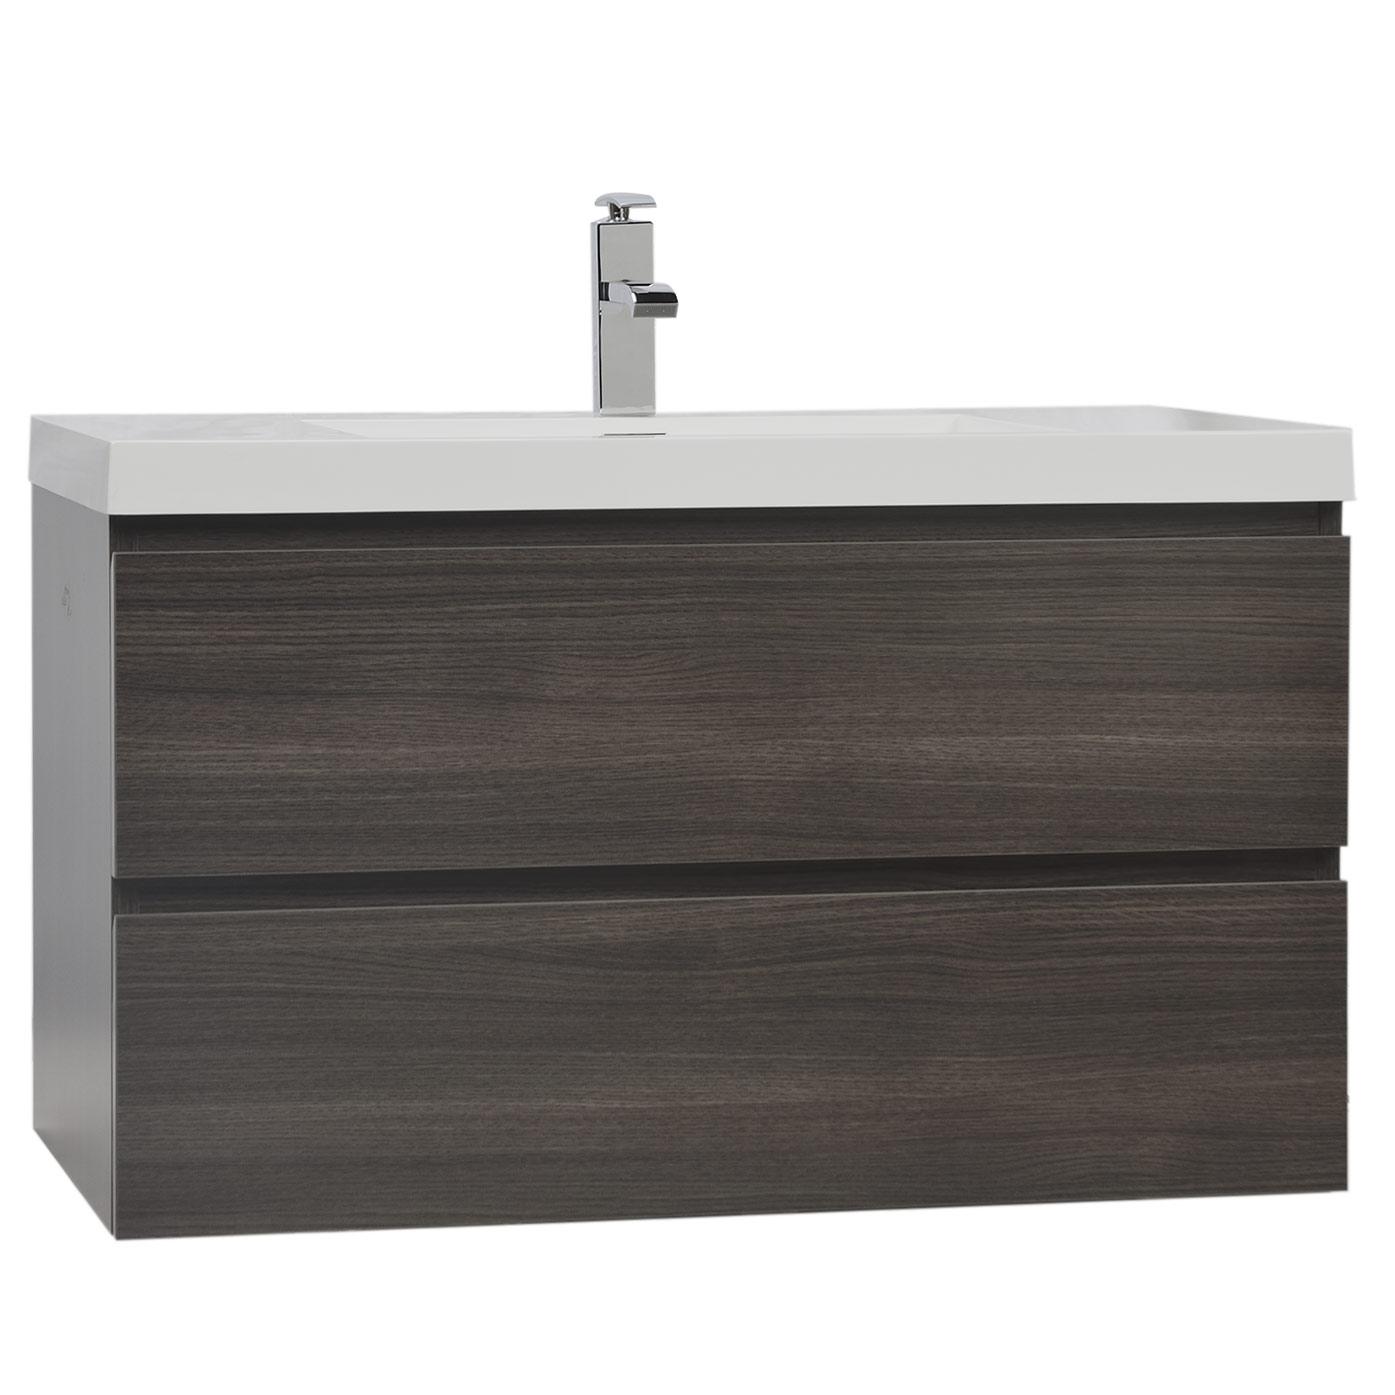 Buy Angela 35 5 In Wall Mount Bathroom Vanity in Grey Oak TN